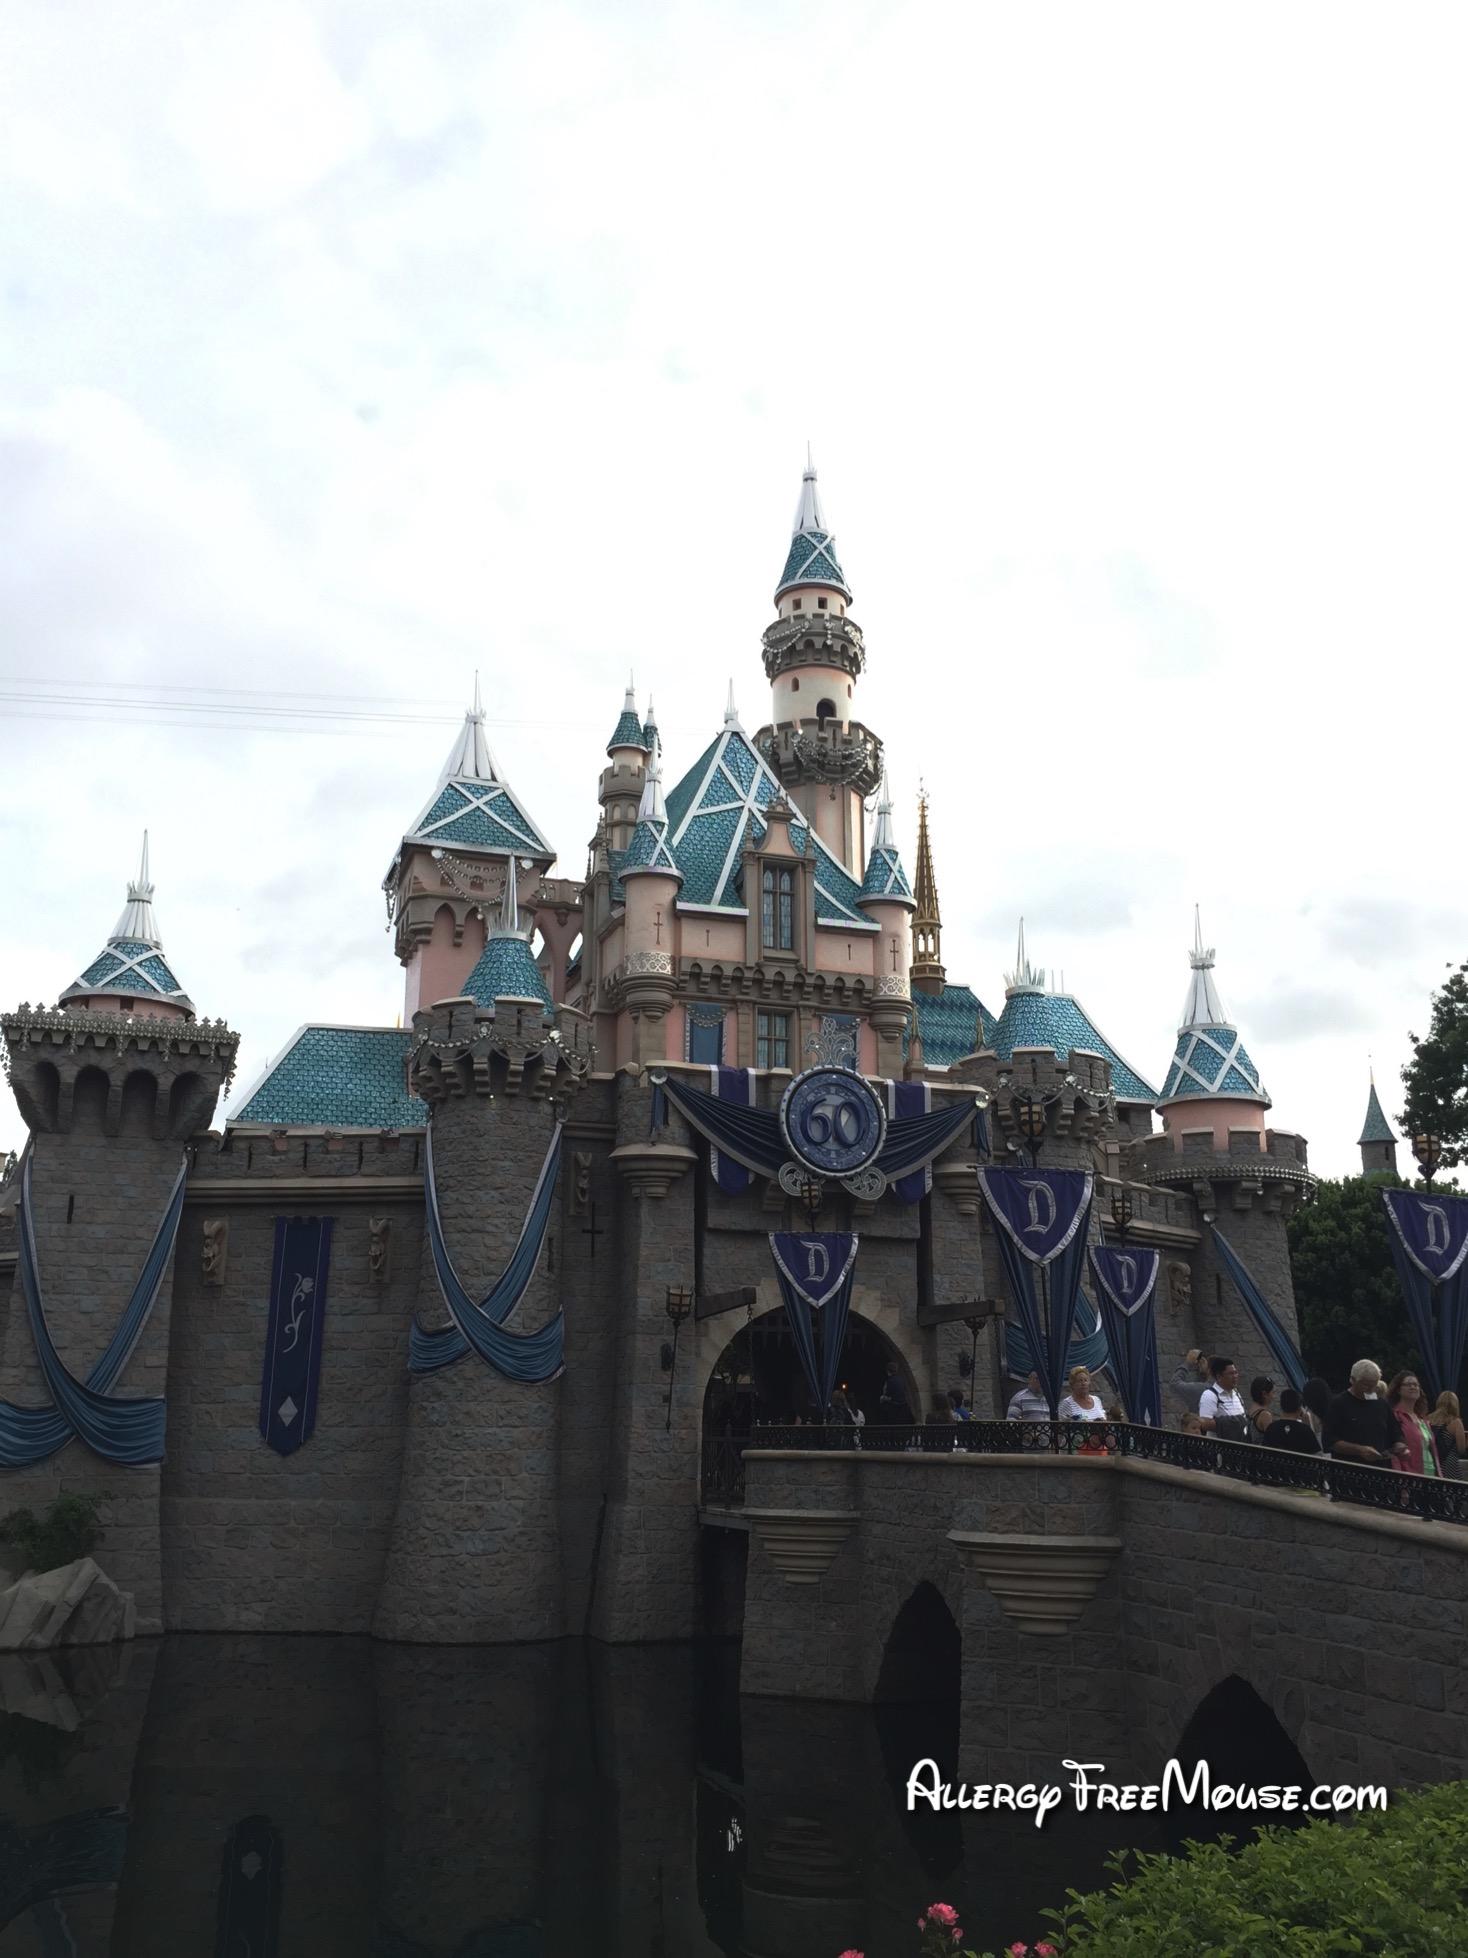 Disneyland Sleeping Beauty's Castle